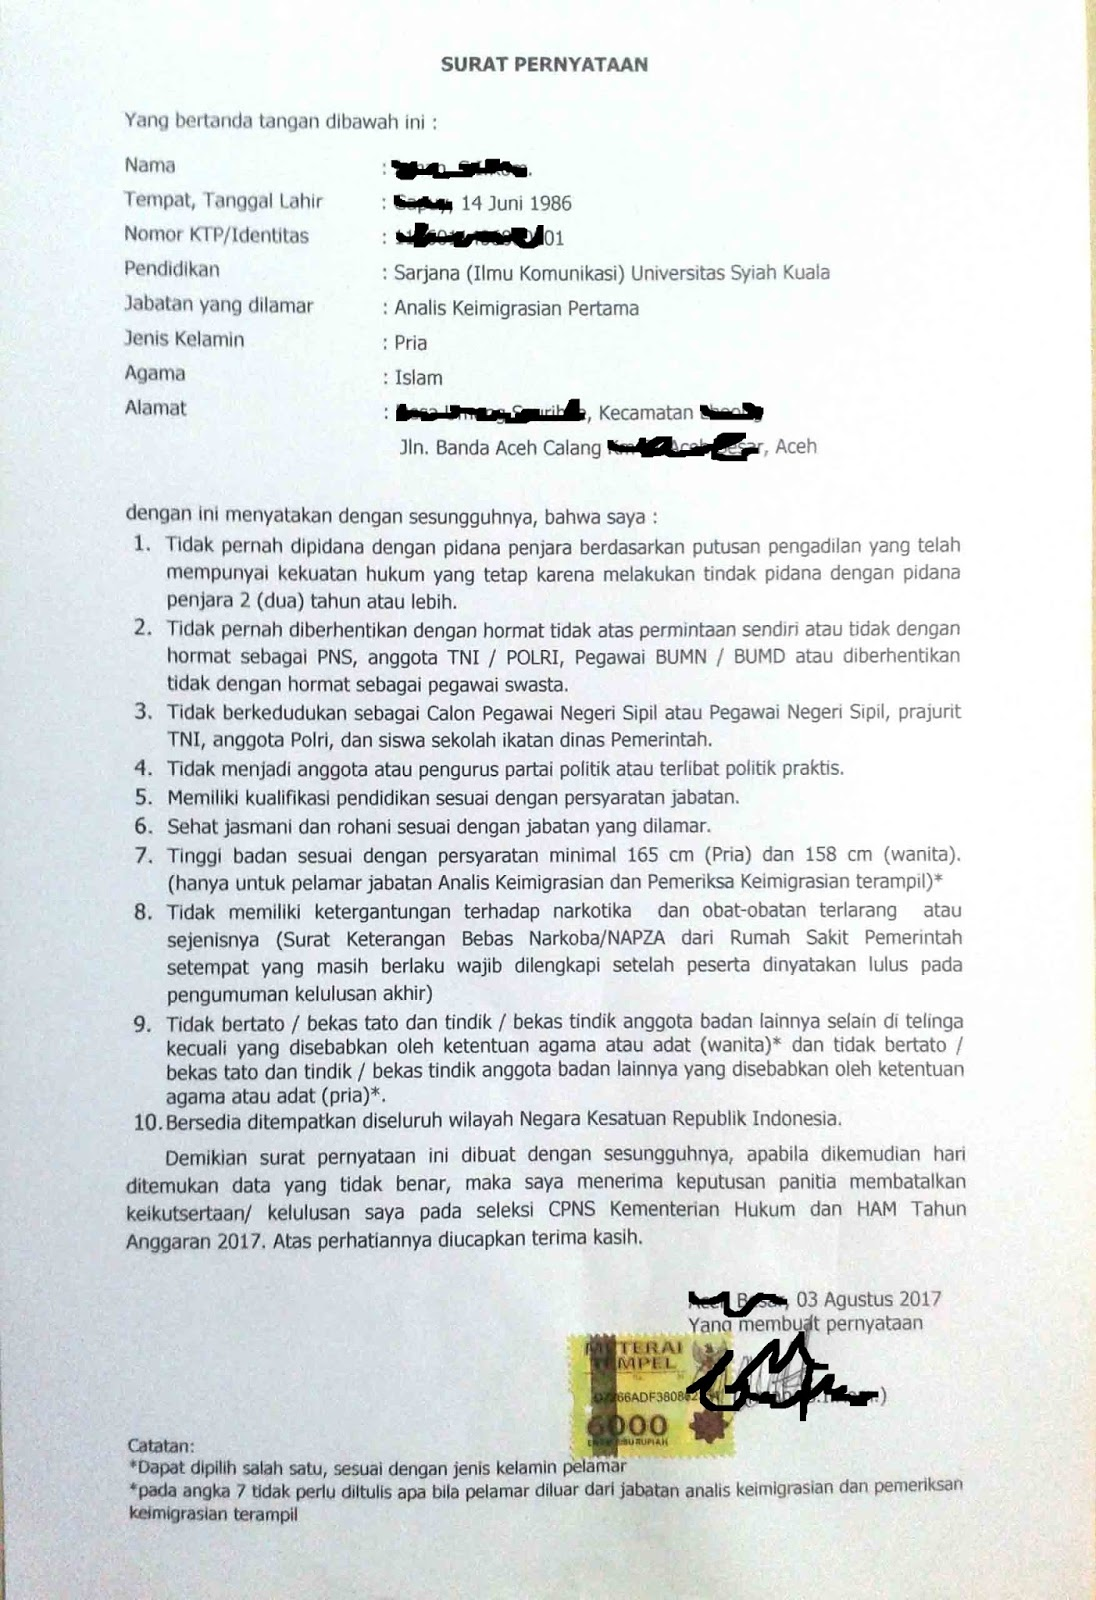 Contoh Surat Pernyataan CPNS Kemenkumham Terbaru - List Kerja